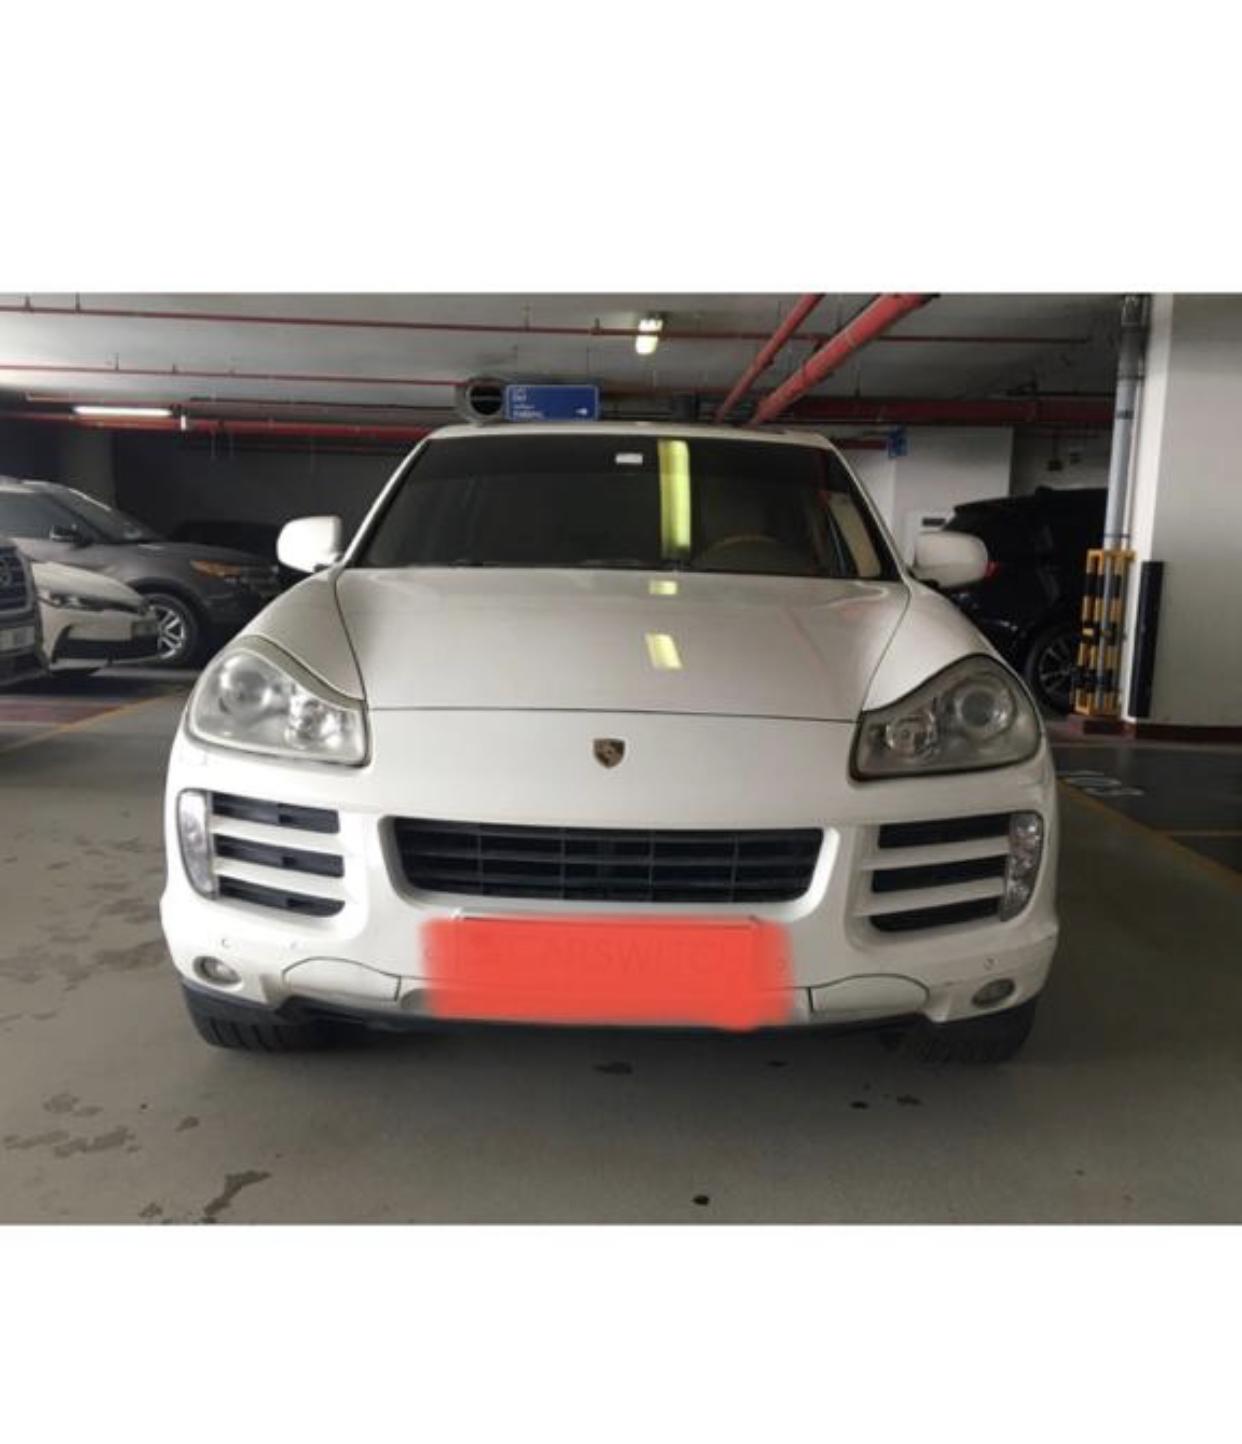 Porsche Cayenne S for sale no accident white color - Image 1